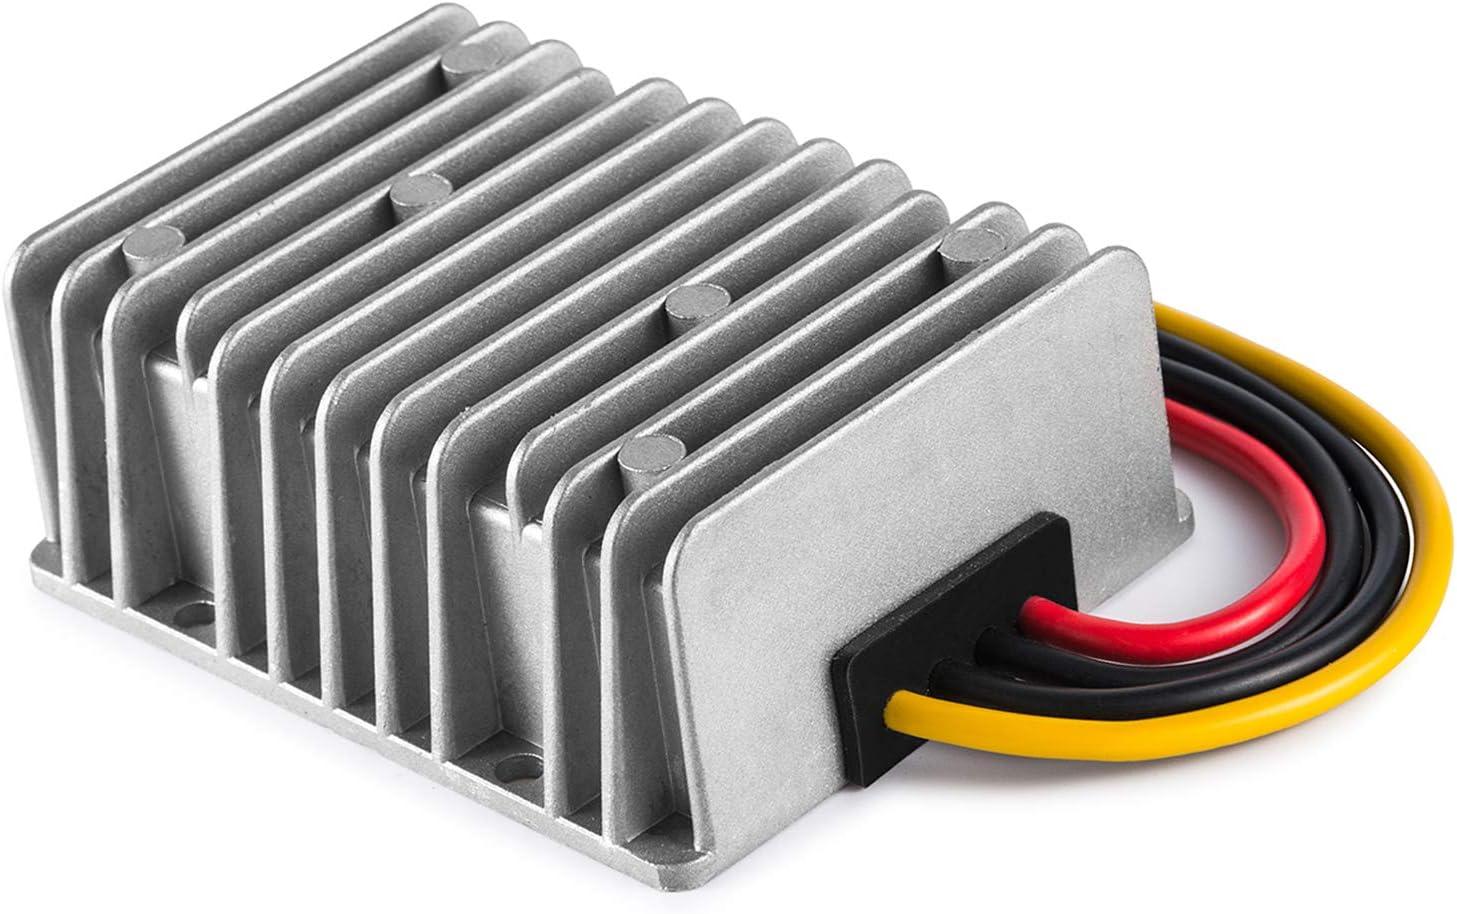 MGGi Voltage Converter Regulator Ranking TOP13 DC 12V 24V Step 4 Down Max 45% OFF